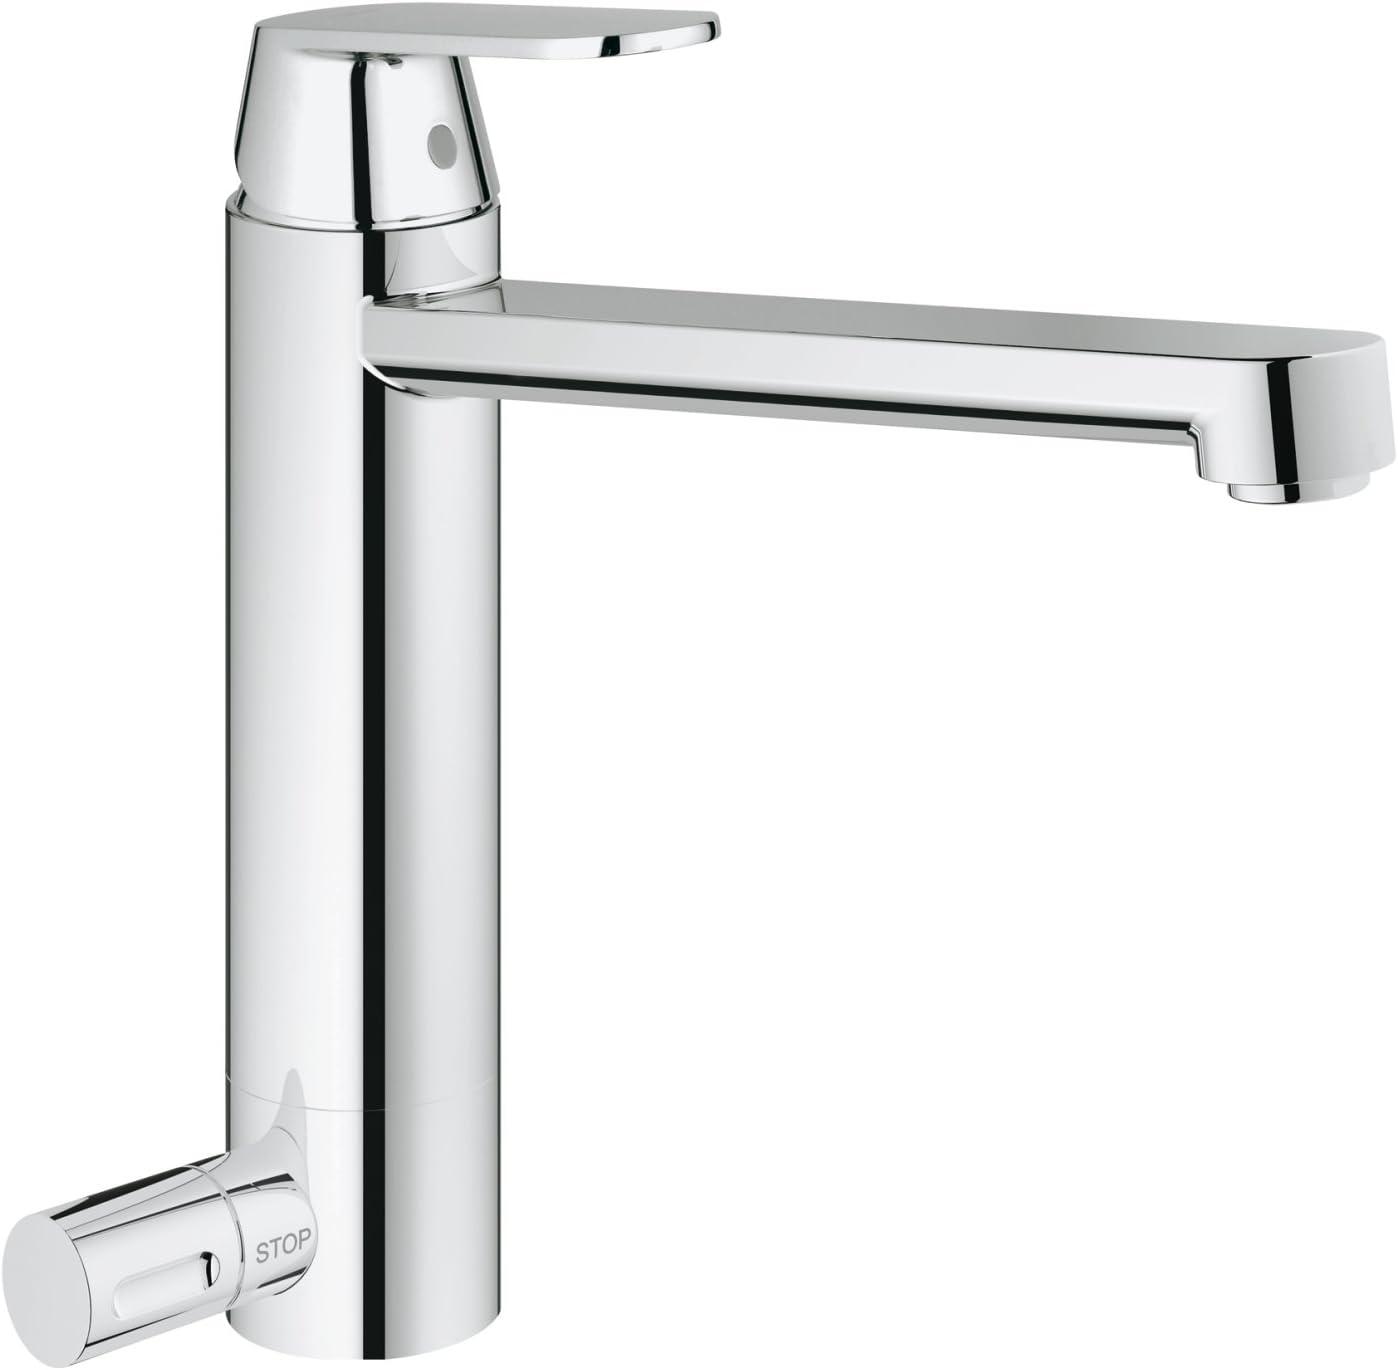 GROHE Eurosmart Cosmopolitan 30195000 Dishwasher Tap Mixer with Chrome